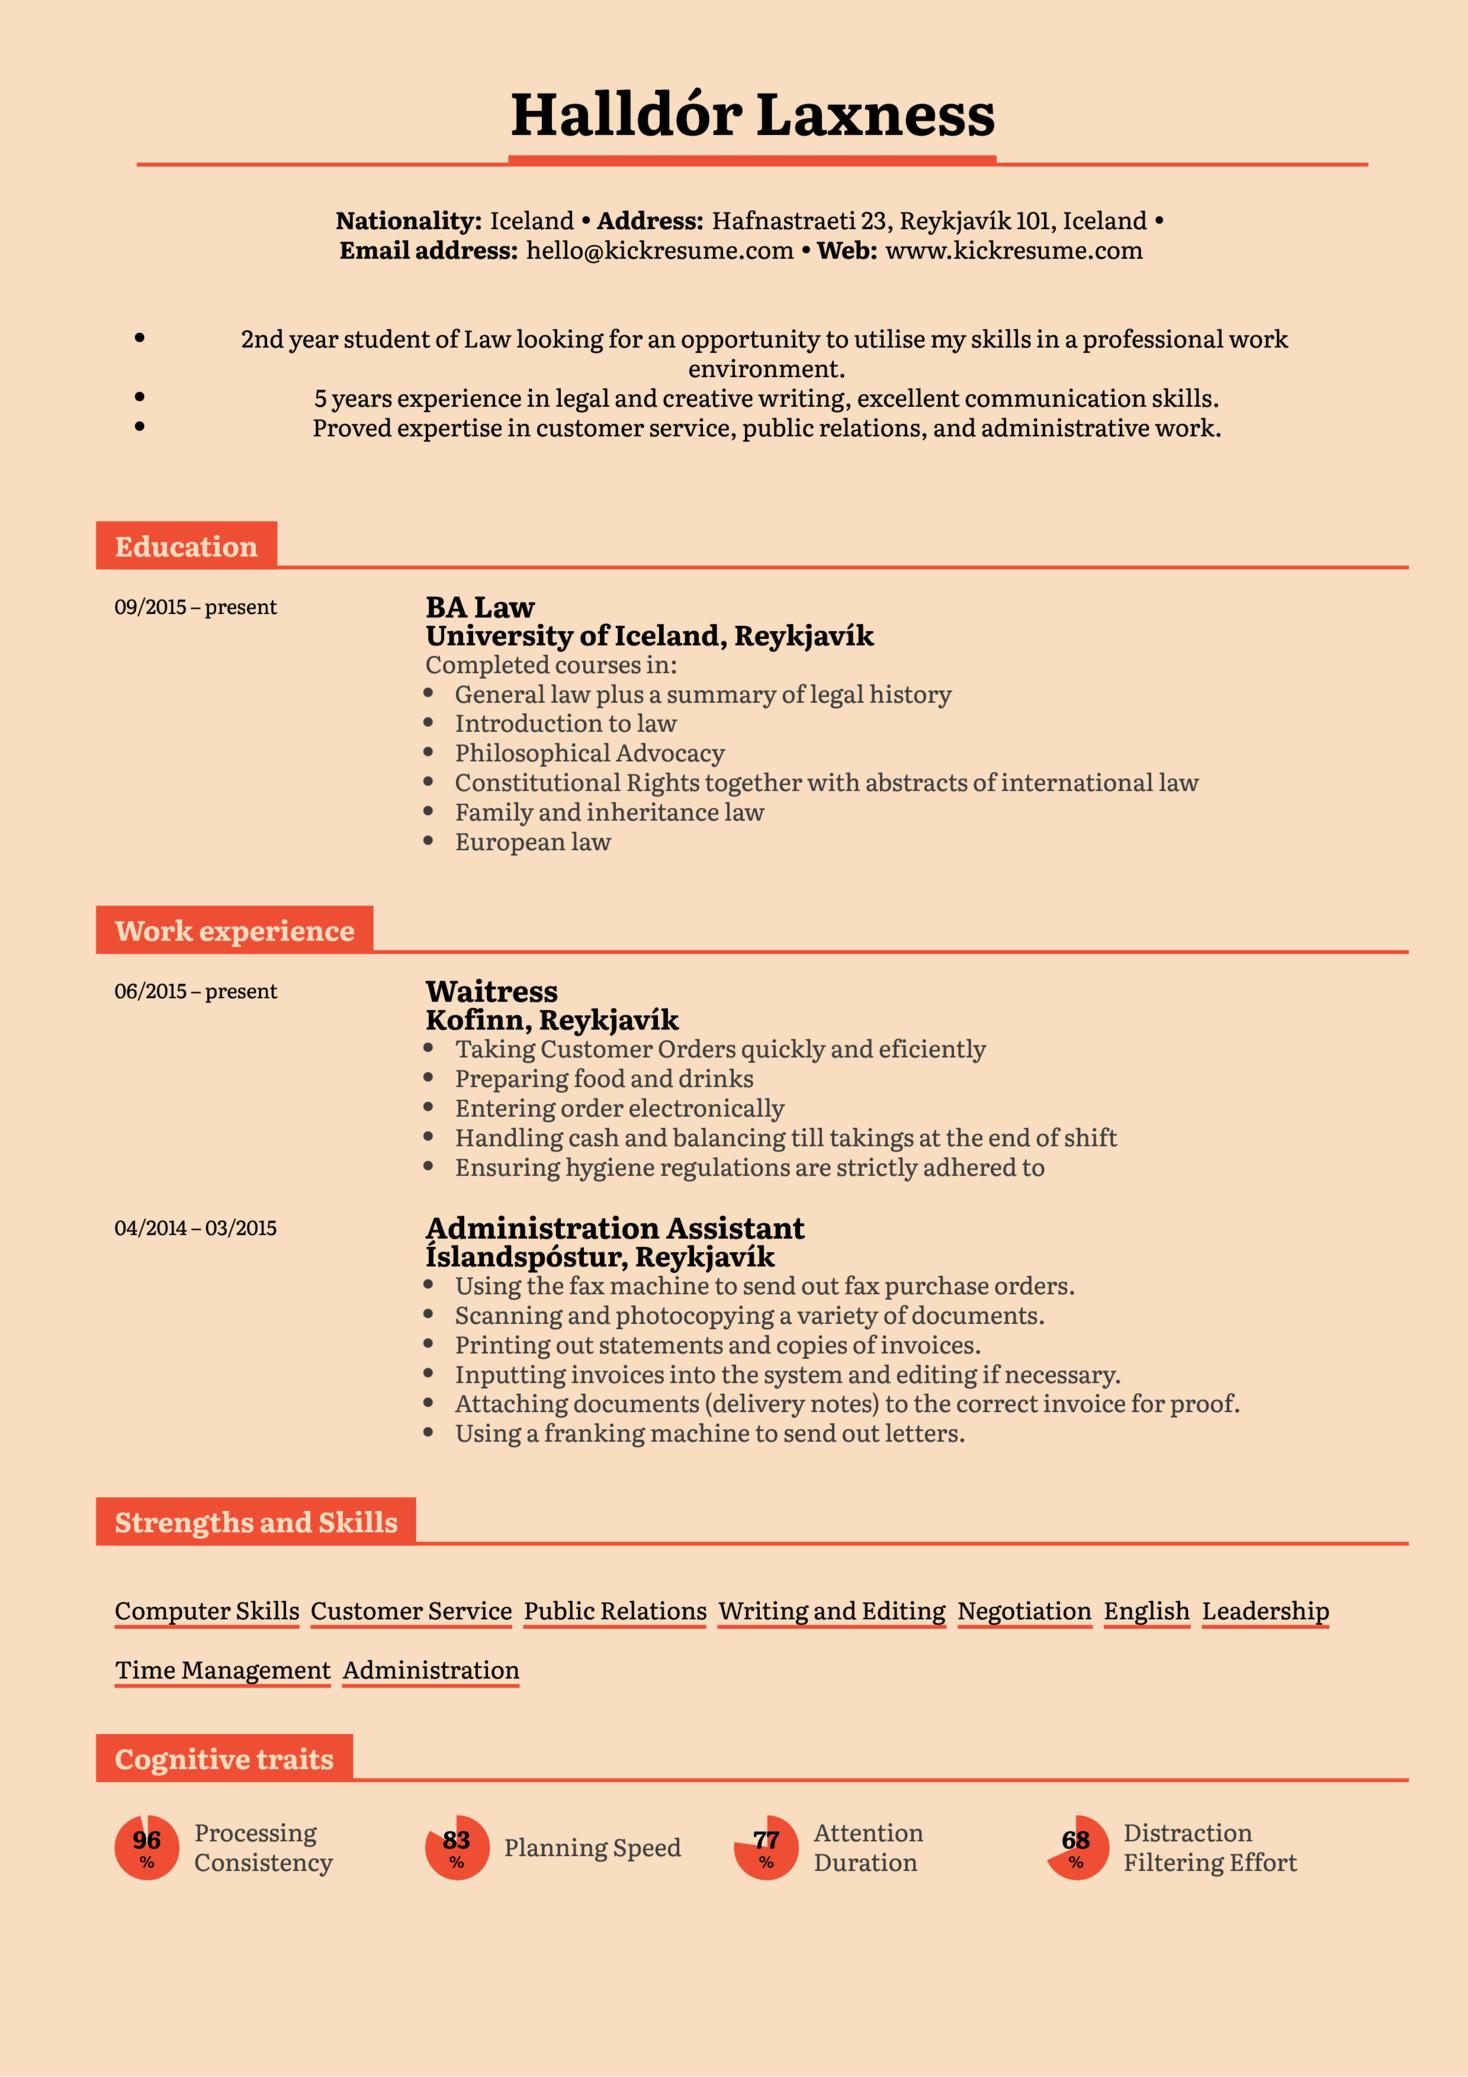 Student Resume Law Internship (Part 1)